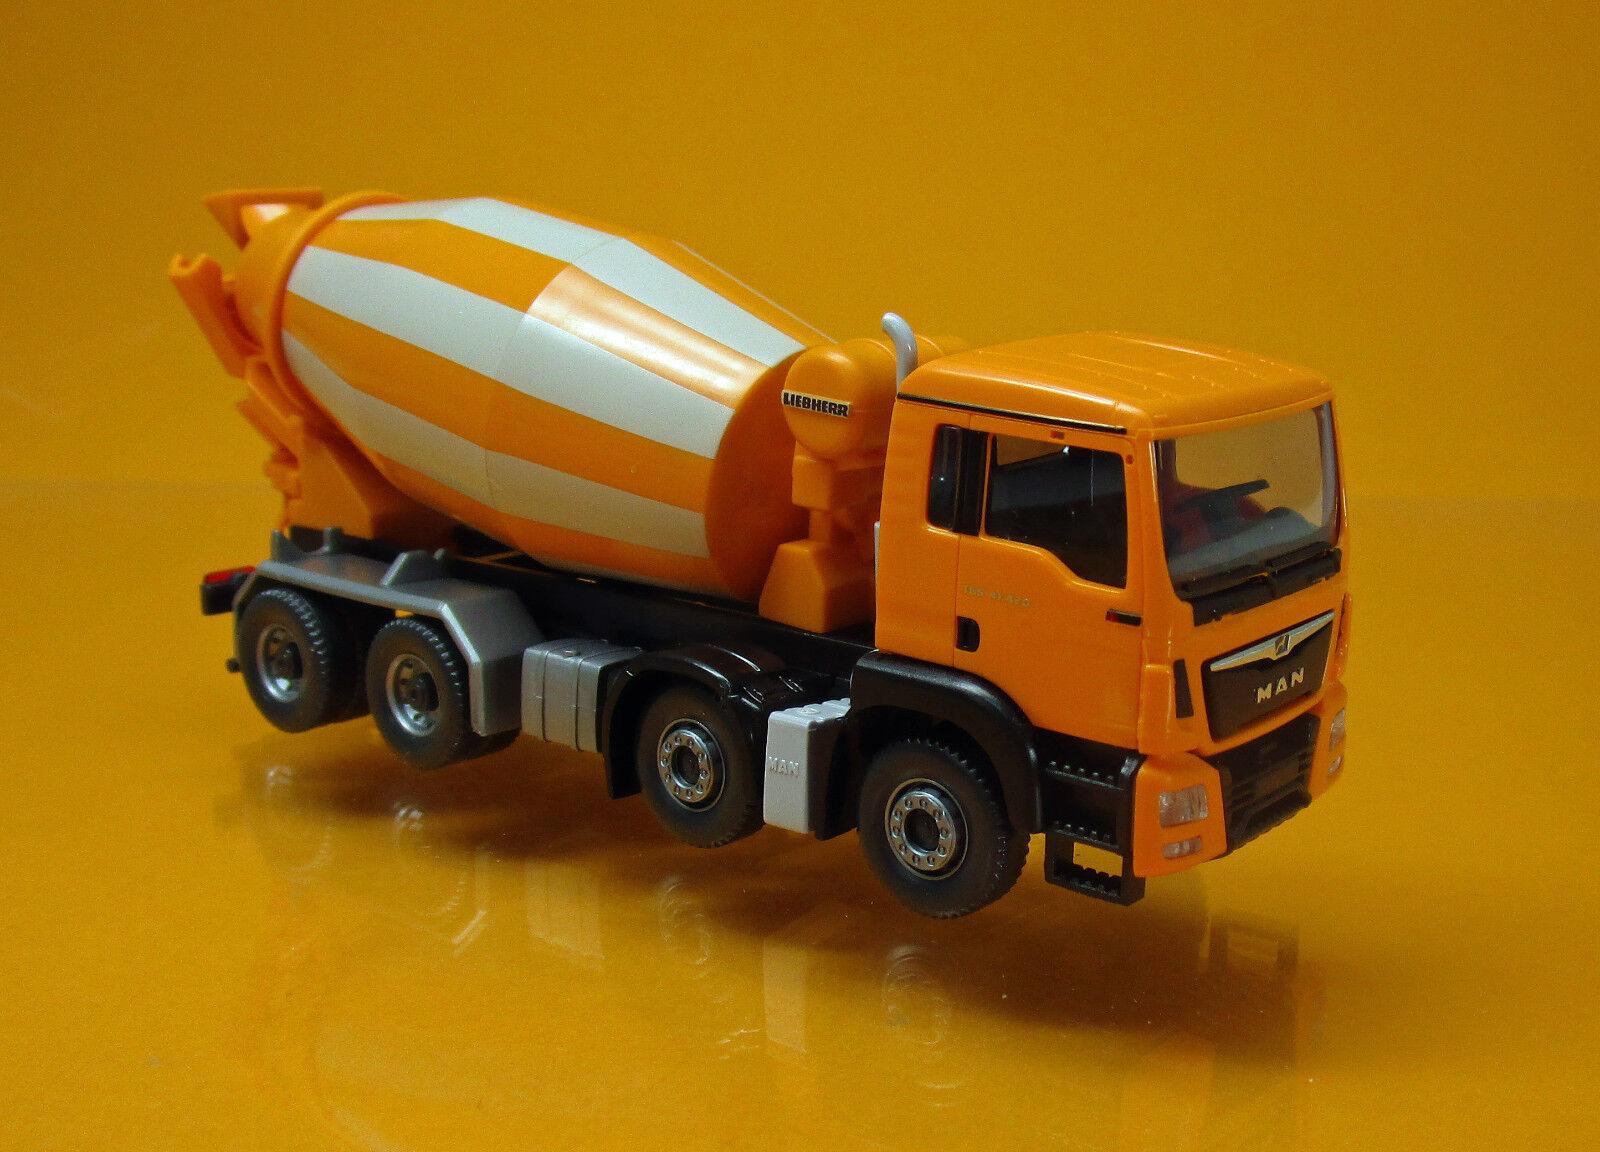 Wiking Wiking Wiking 068148 Man tgs euro 6 Liebherr conducción mezclador naranja scale 1 87 nuevo embalaje original 47a385